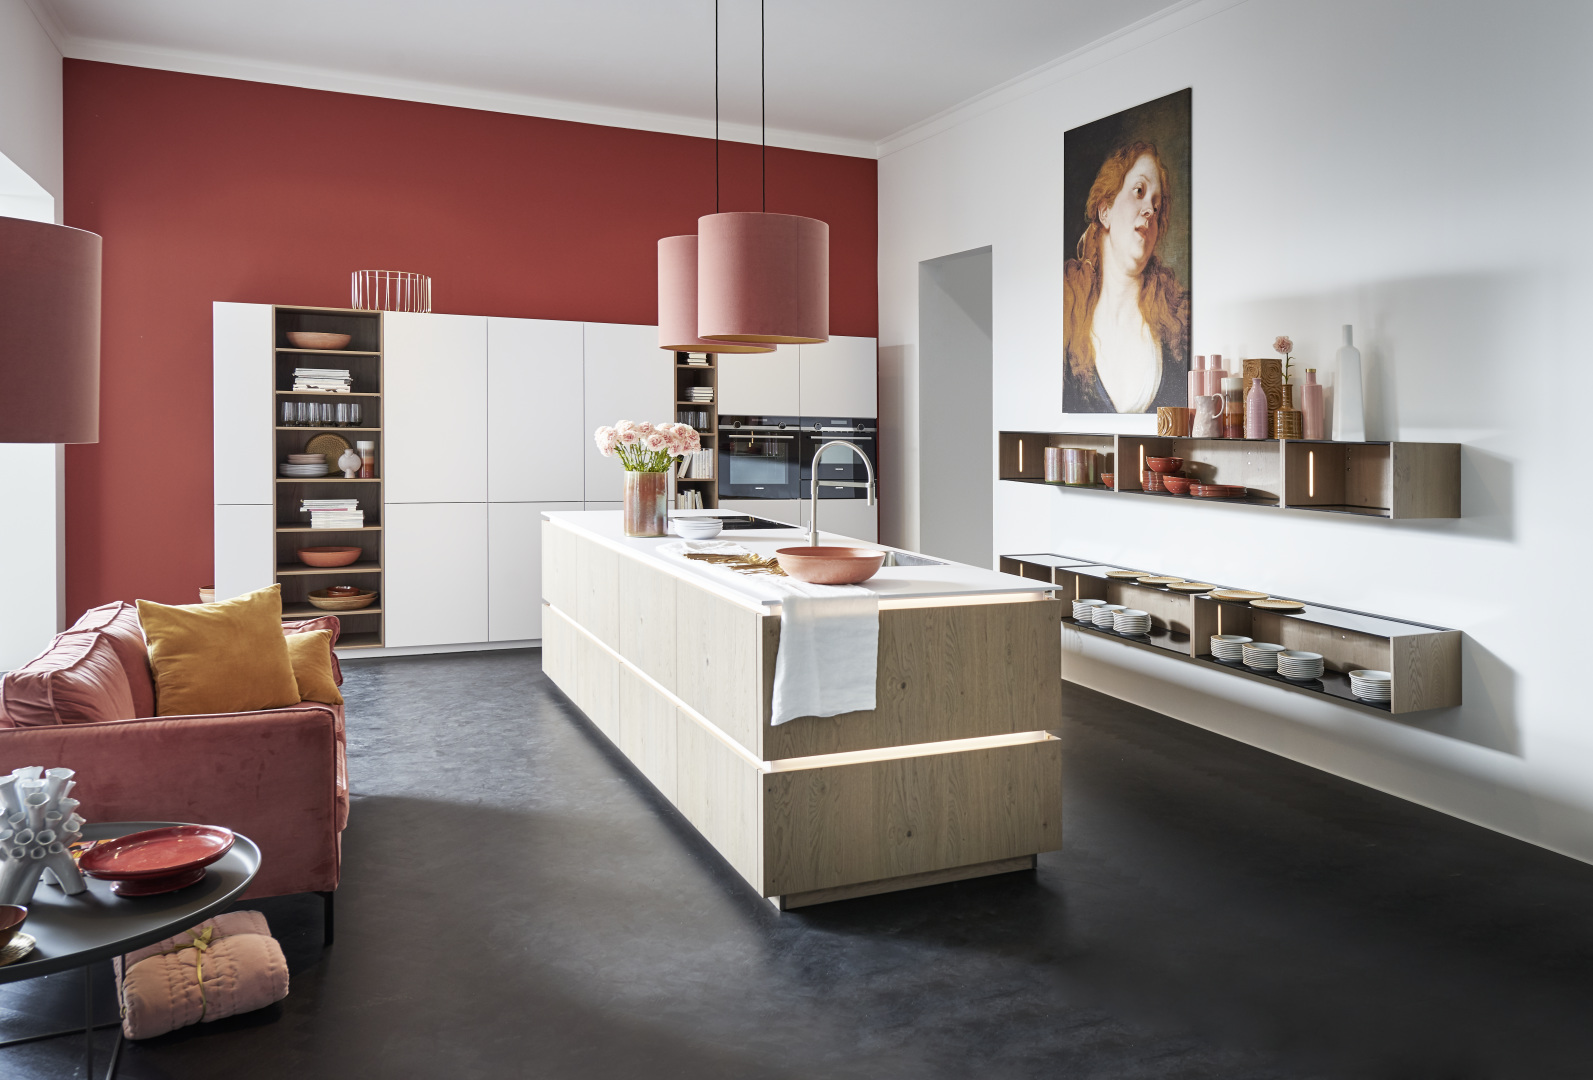 Tavola – Eiche Pinot / Phoenix – Weiß softmatt